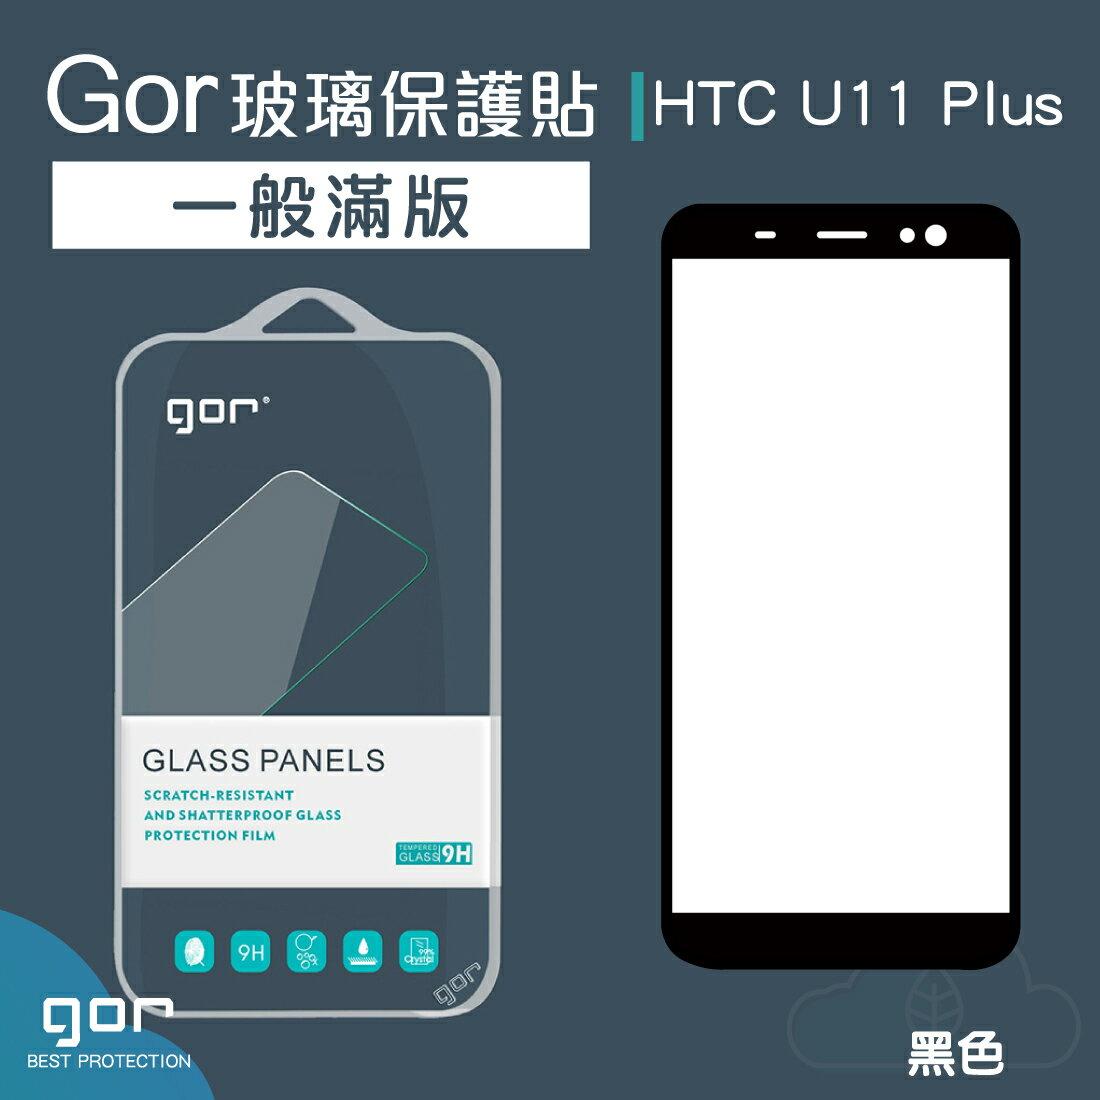 GOR 9H HTC U11 Plus 滿版 全膠貼合 玻璃 鋼化 保護貼 另售 空壓殼 全館299免運費